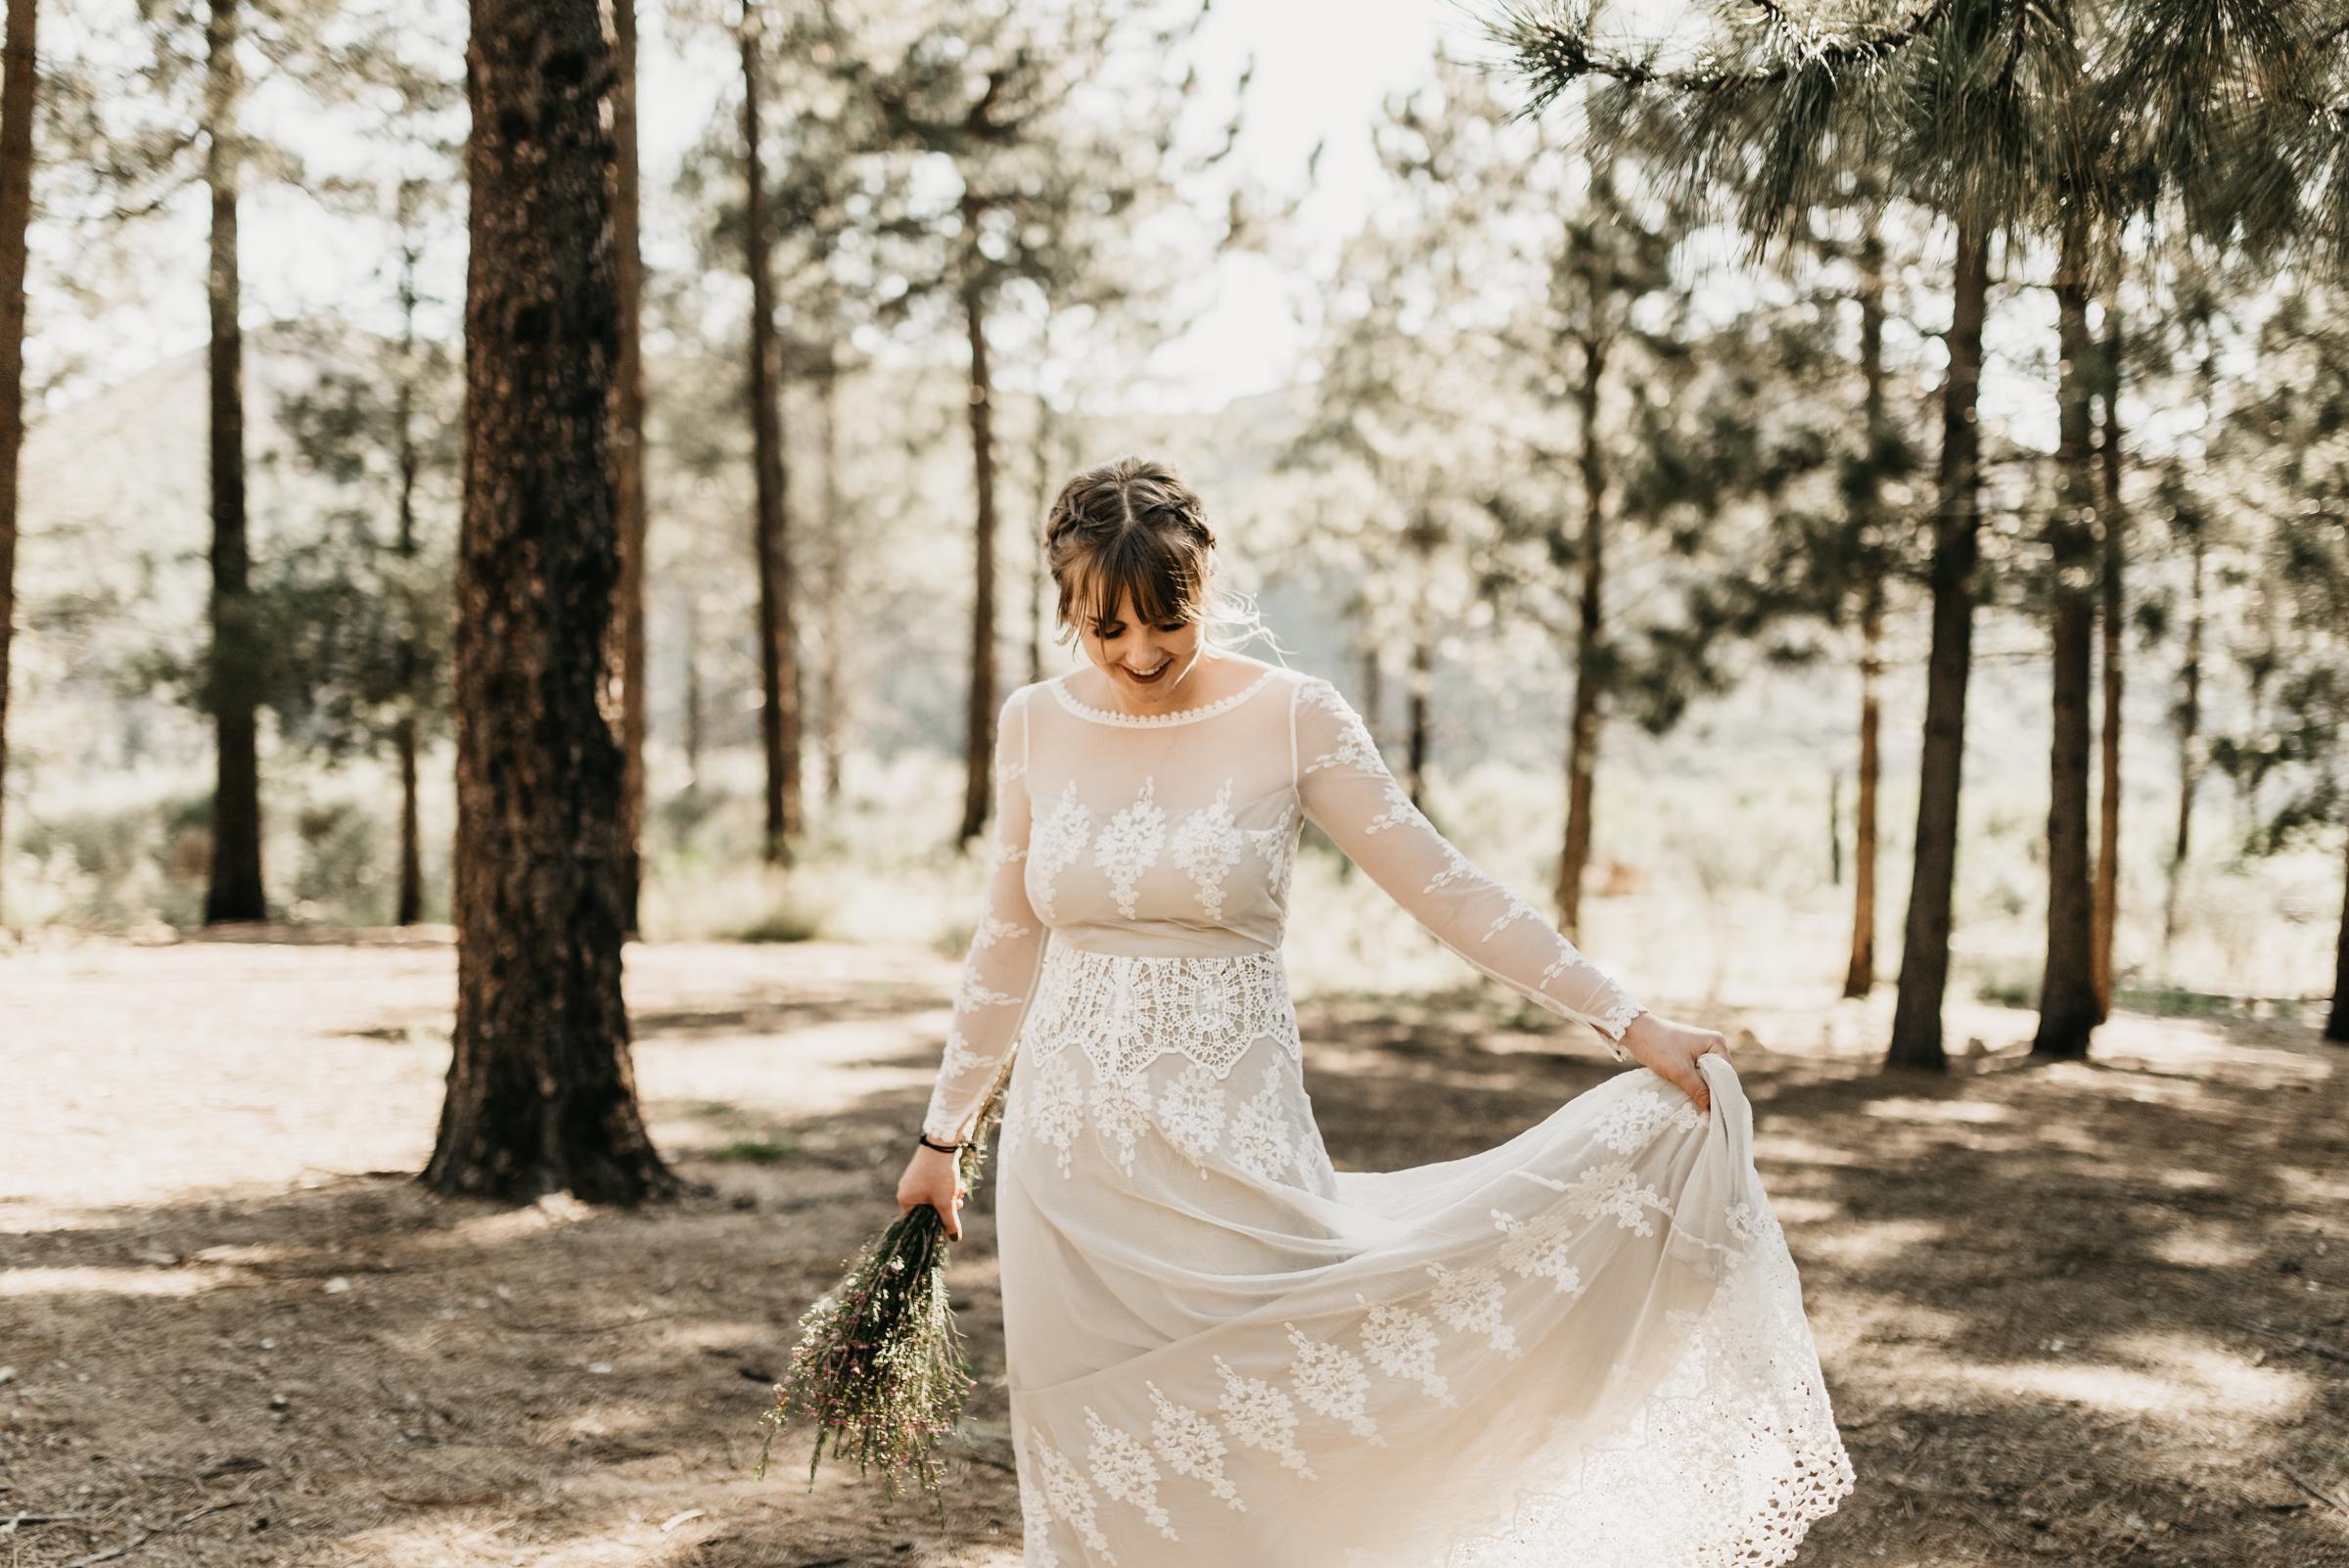 ©Isaiah + Taylor Photography - Los Angeles Wedding Photographers - Los Angeles Forest Wedding -6.jpg